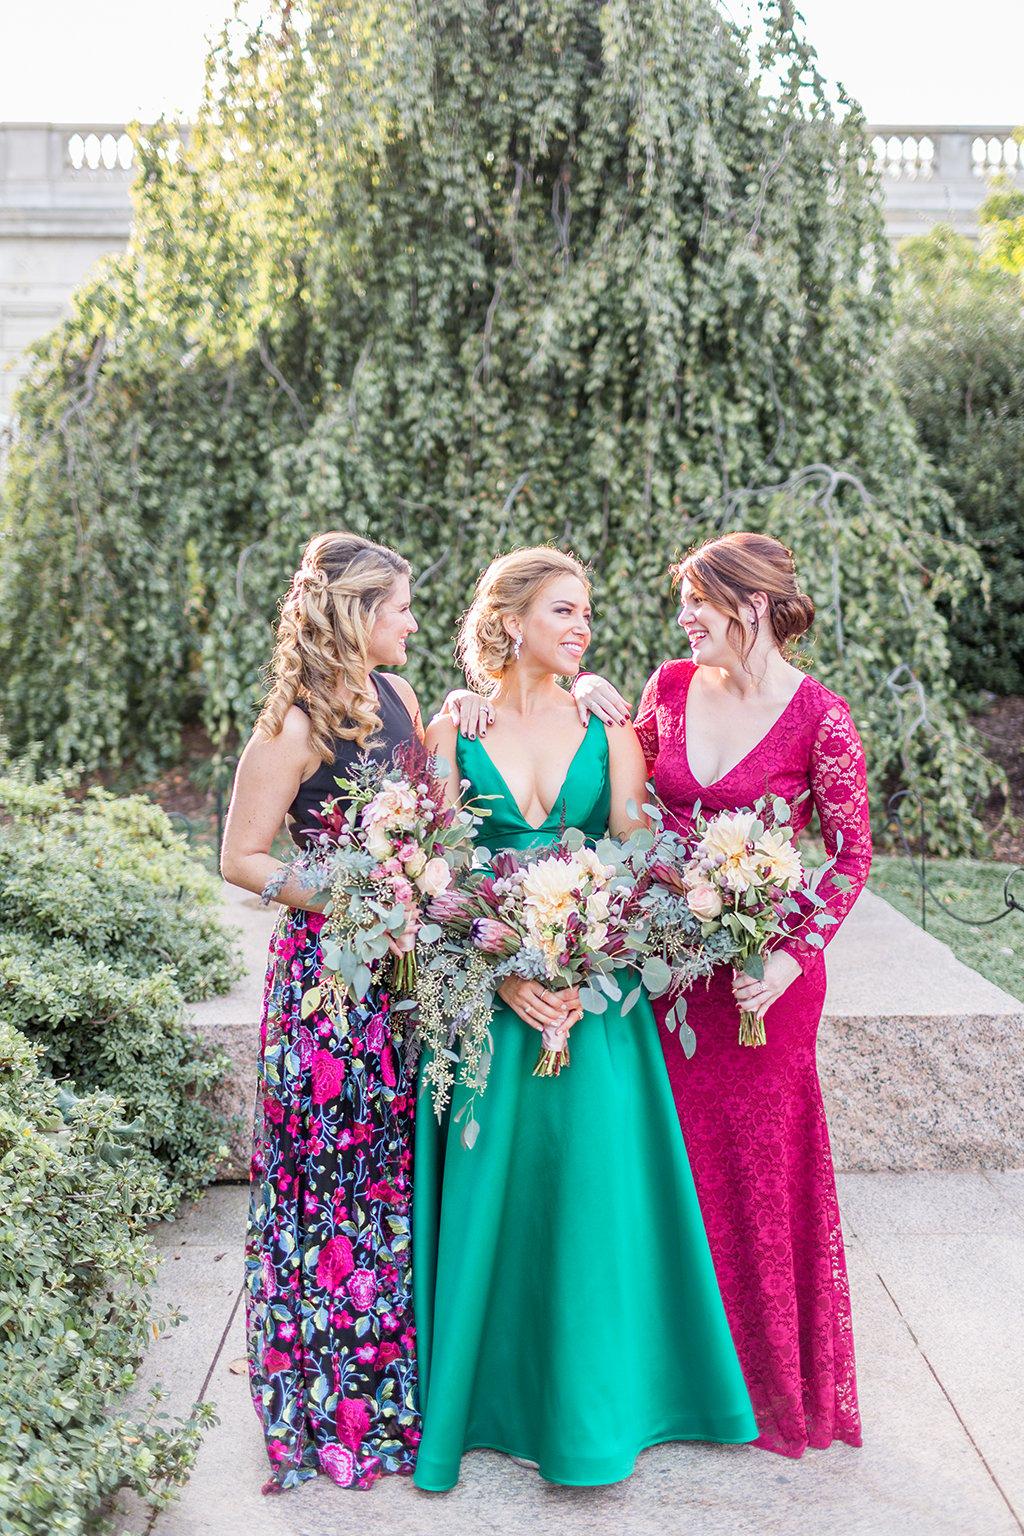 green wedding dress fuss-free wedding dc memorial wedding nontraditional green emerald malachite dress nontraditional wedding dress colorful wedding dress